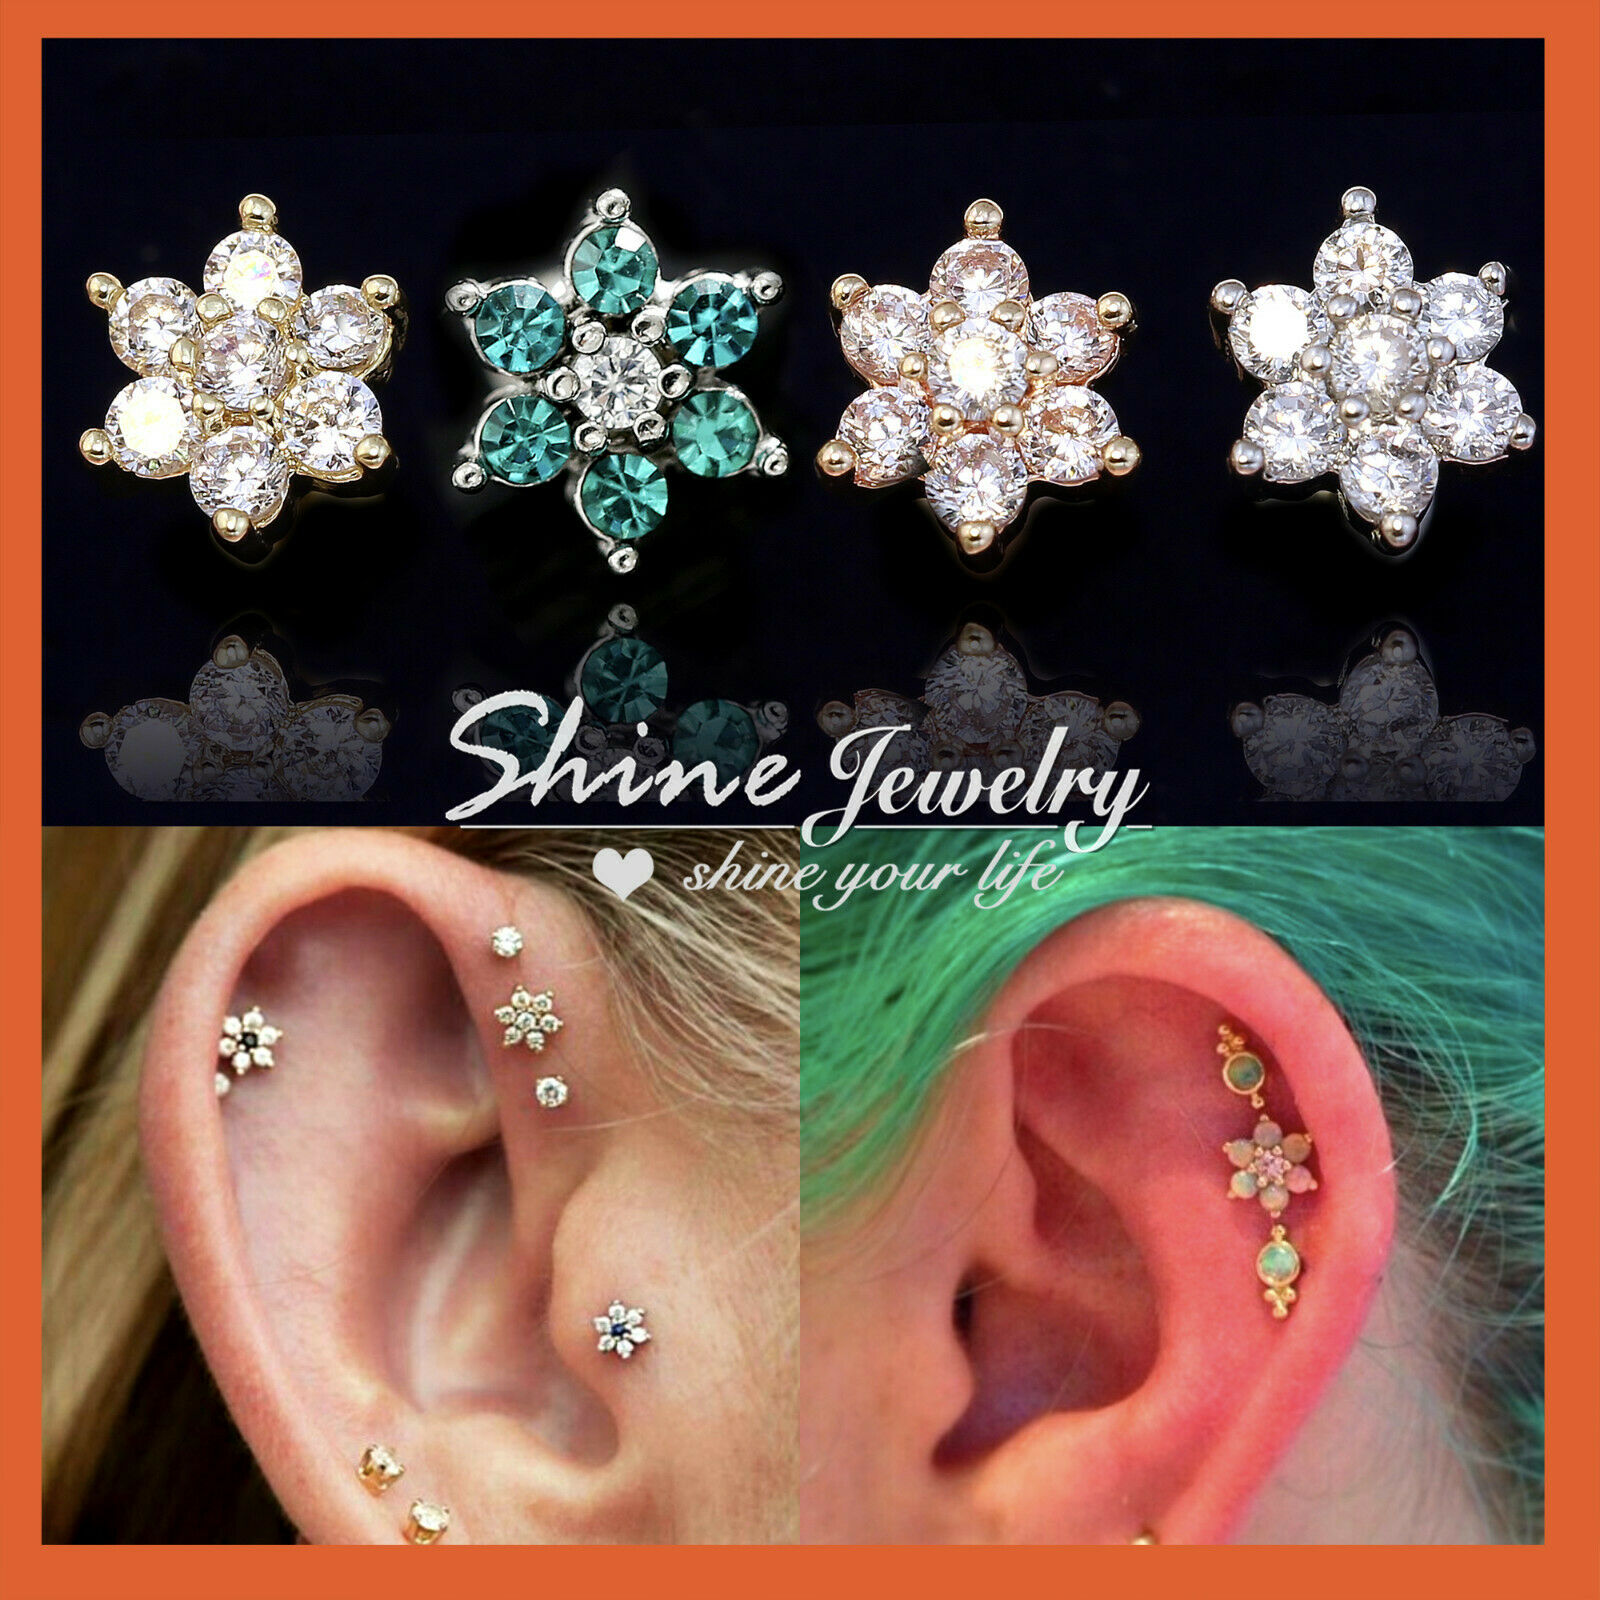 925 Sterling Silver Tiny Cubic Cz Flower Four Petal Stud Earrings 4mm Girl E31